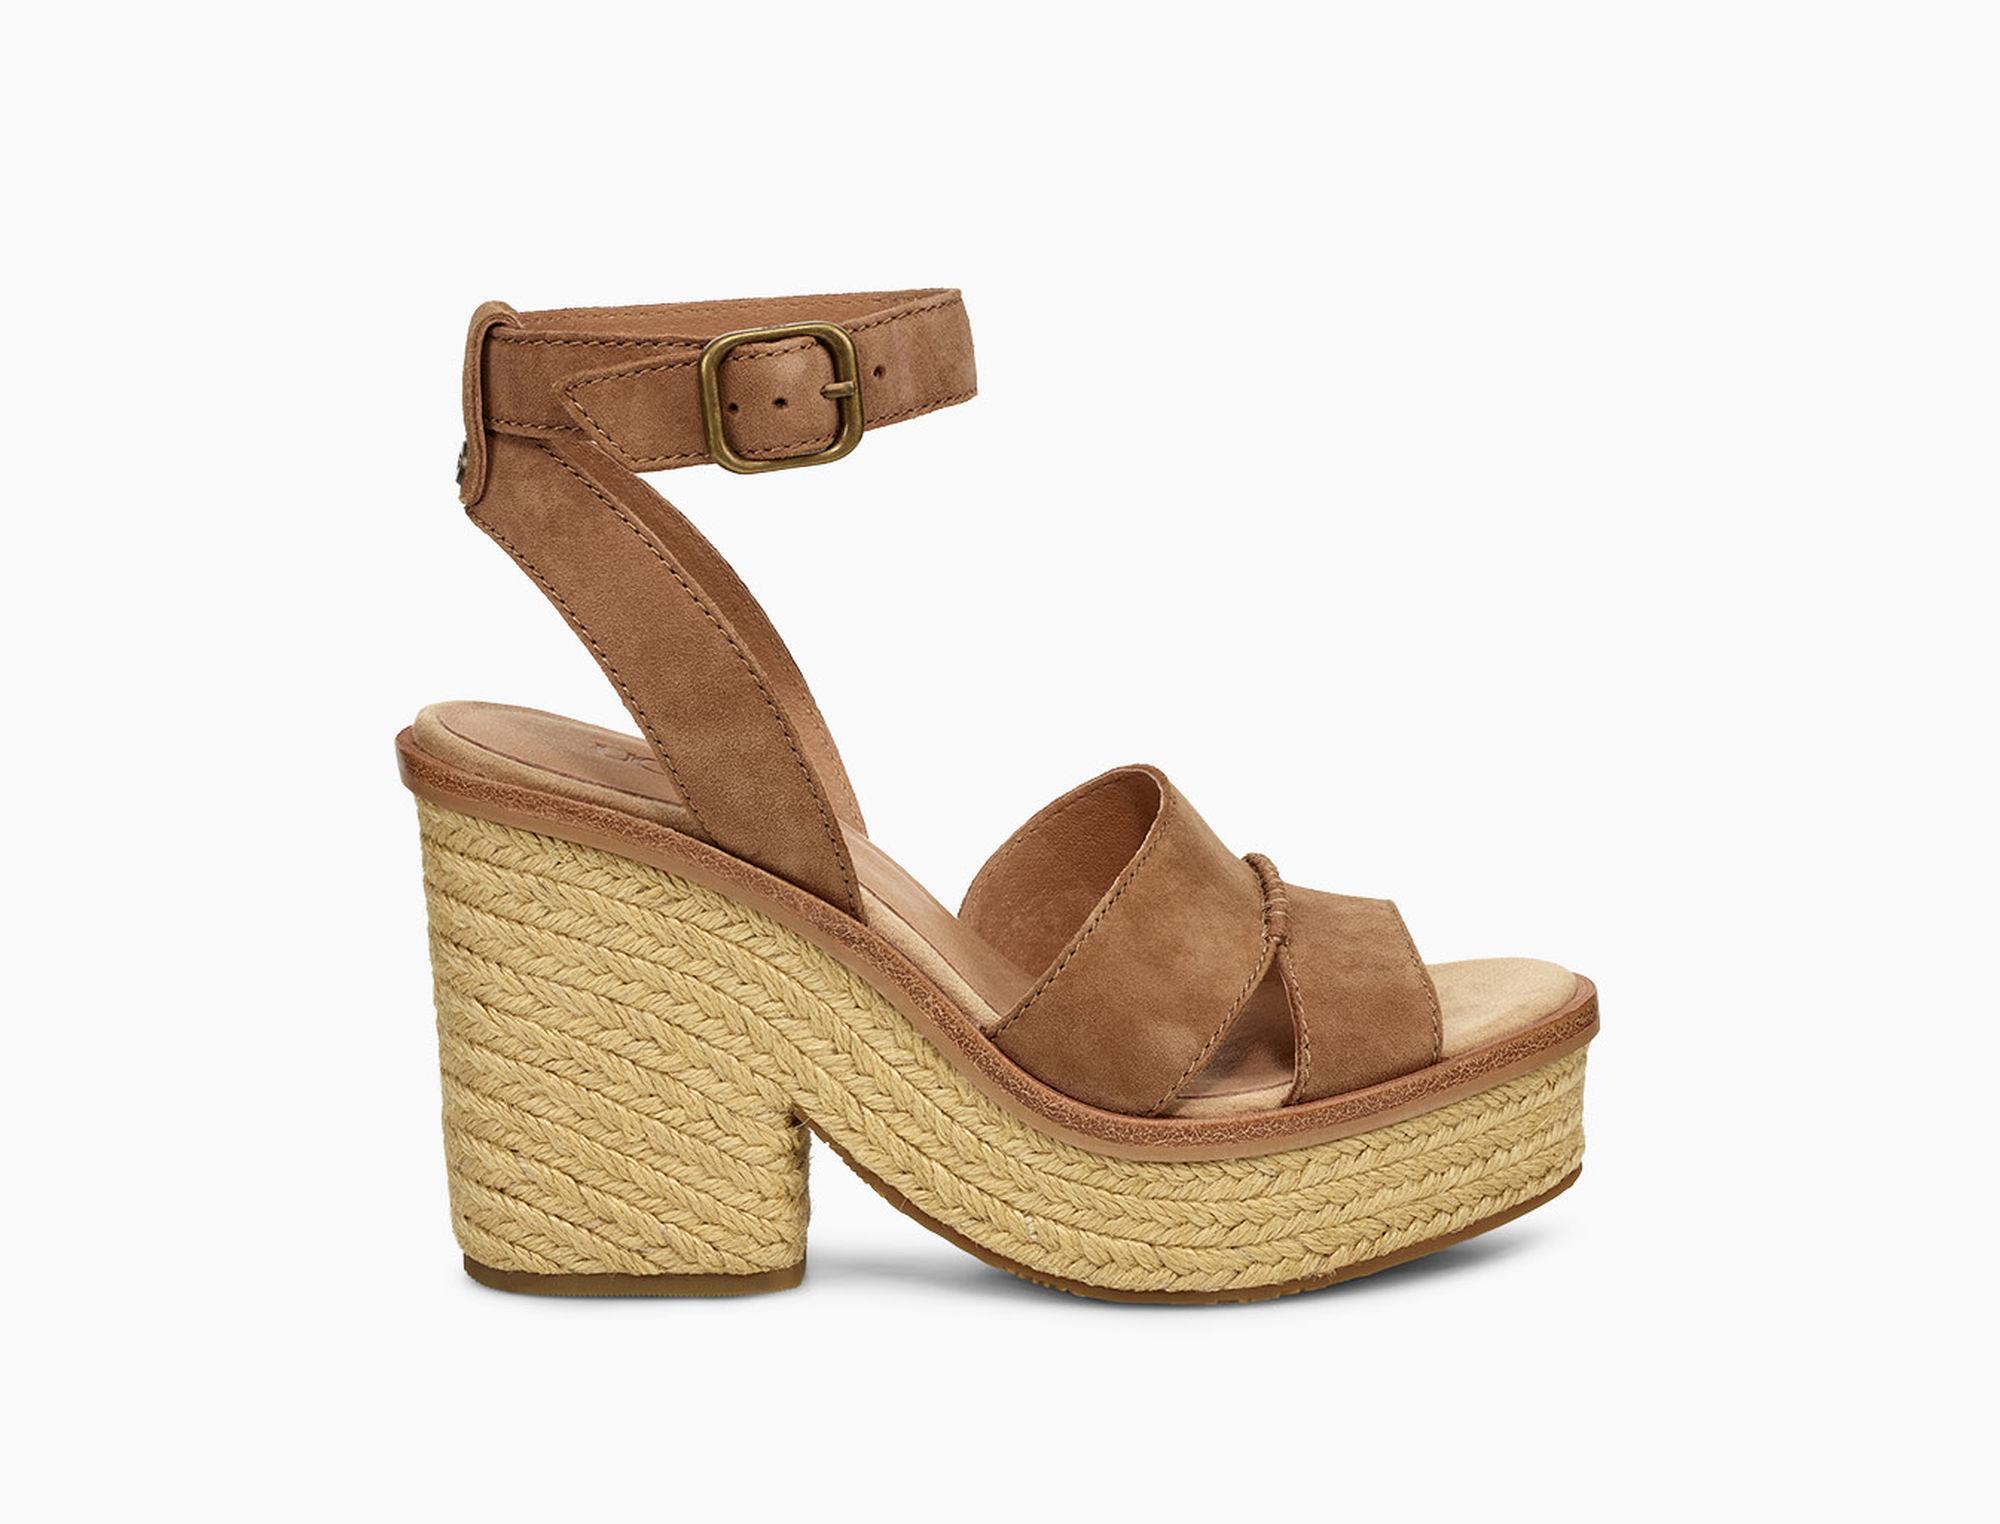 247a042ac65 Lyst - UGG Women s Carine Block Heel Sandal in Brown